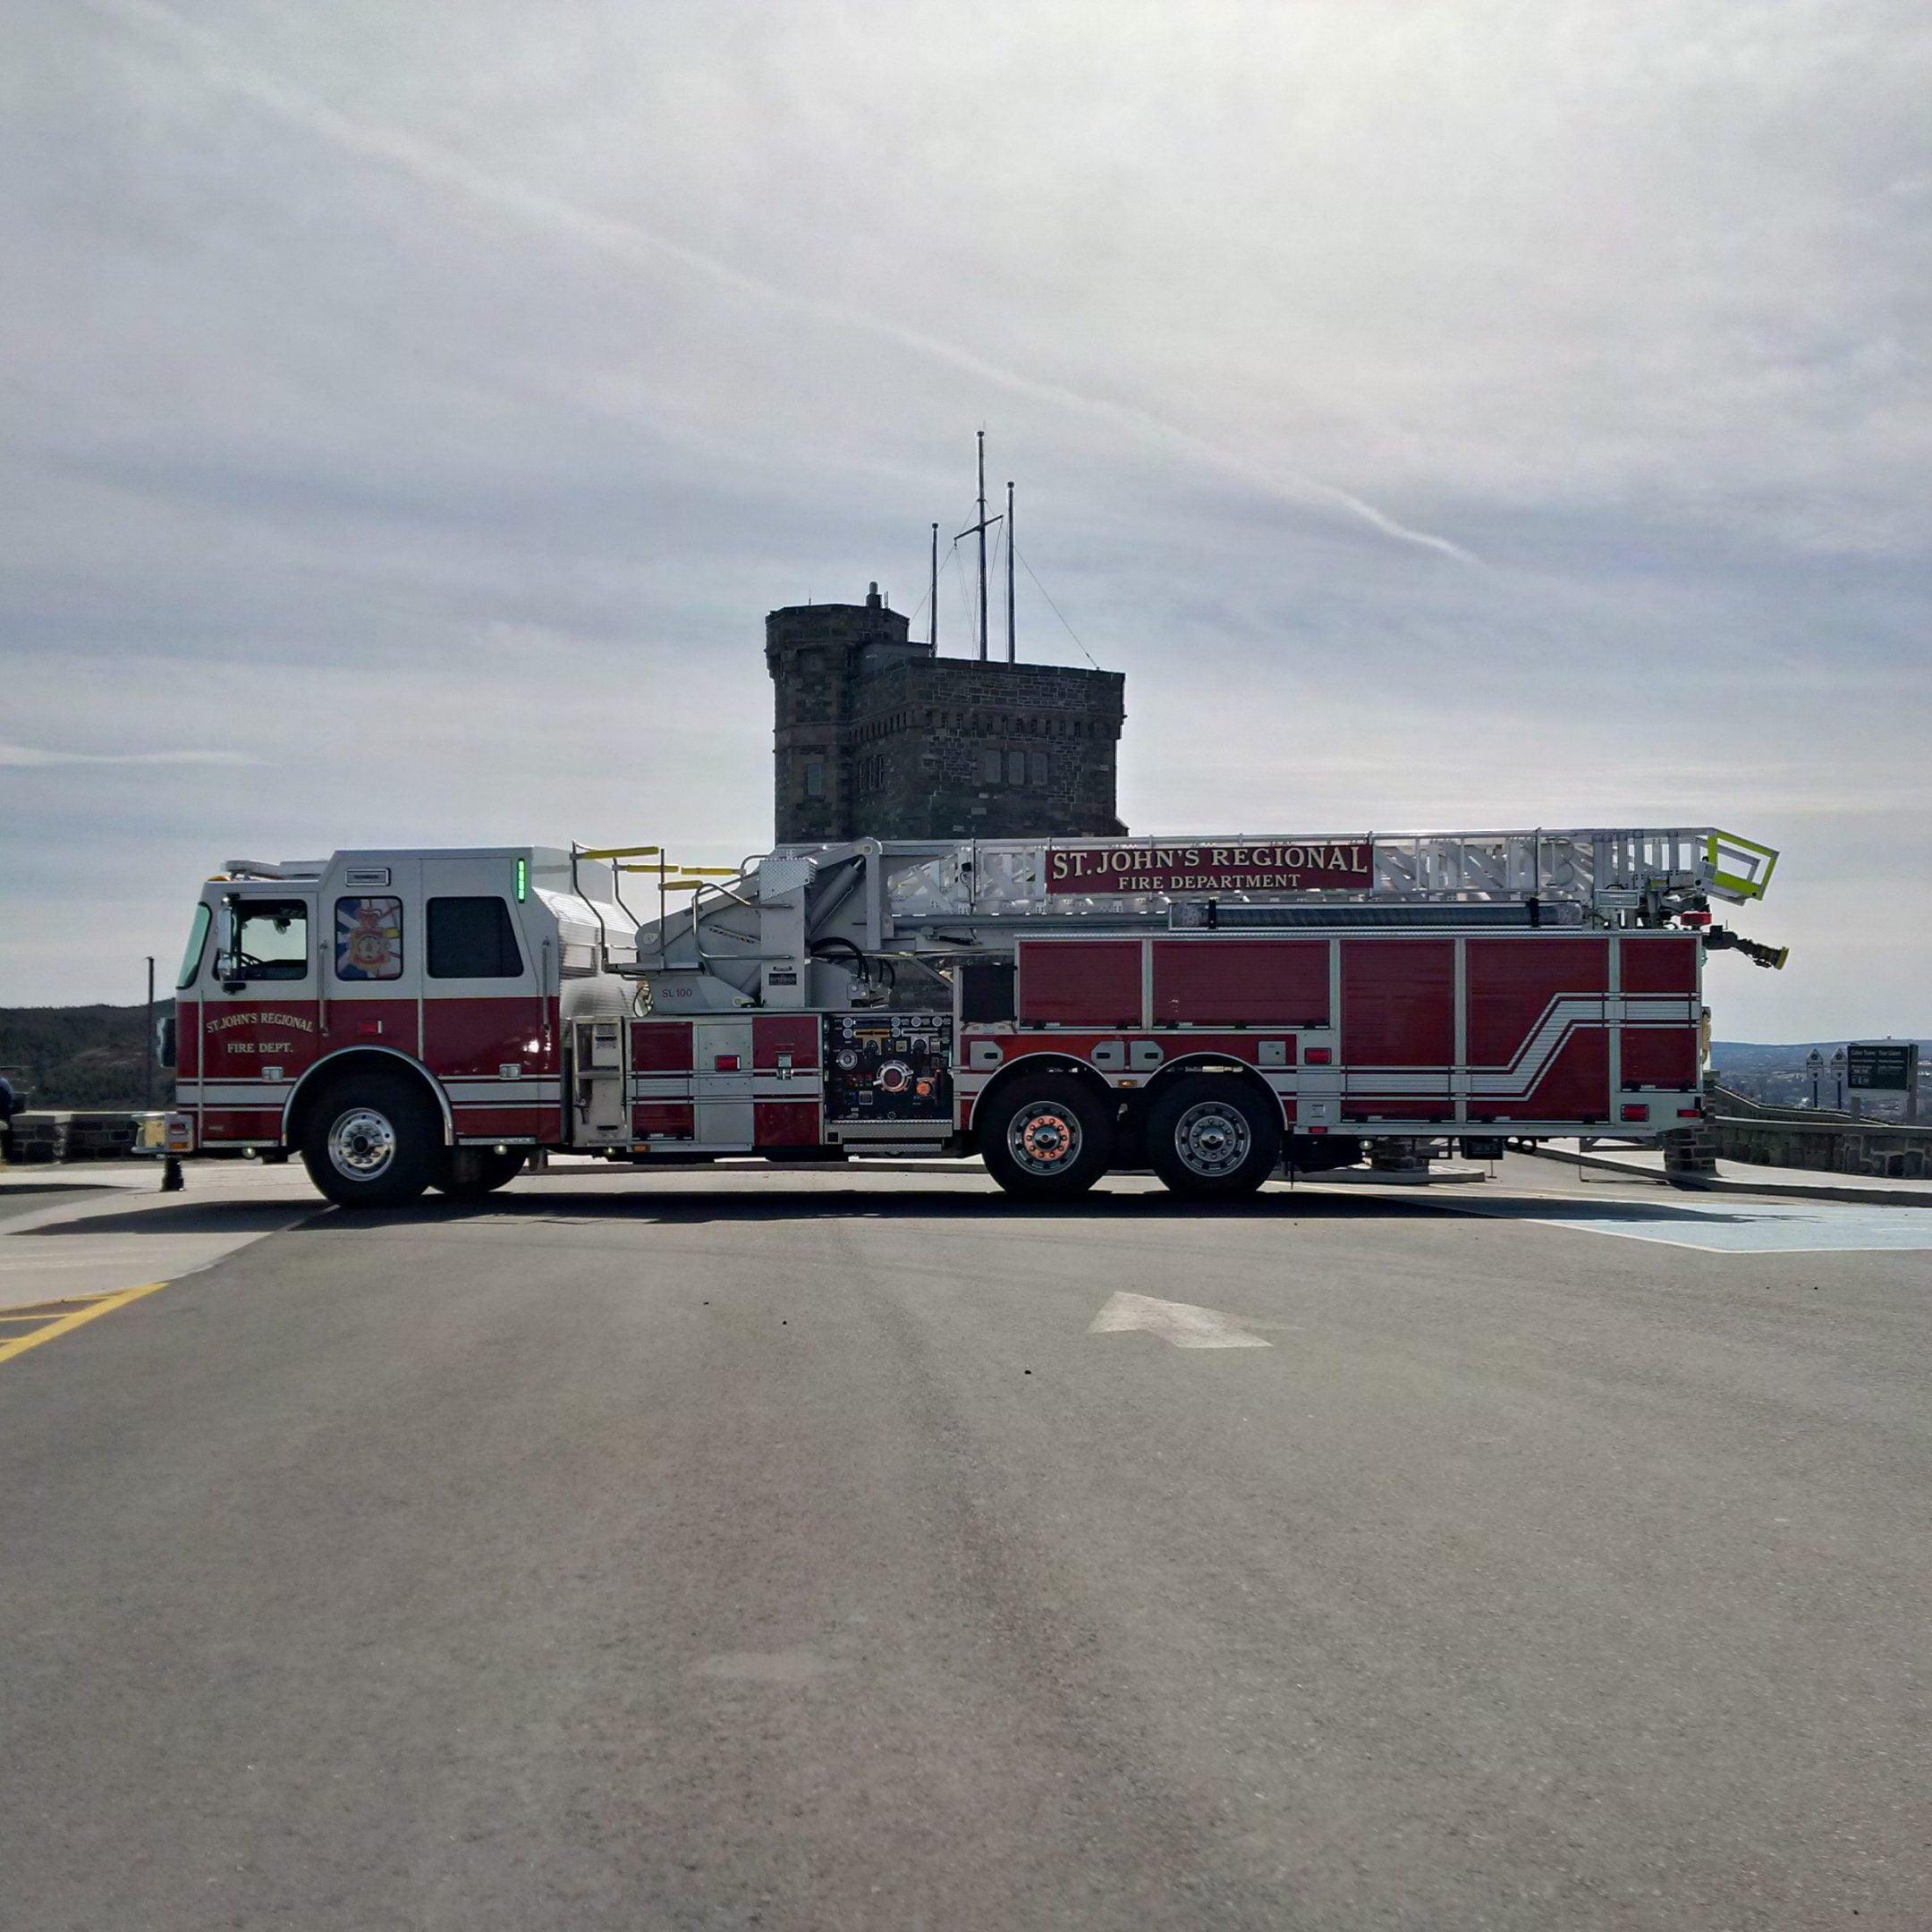 SL 100 – St. John's Regional Fire Department, Newfoundland